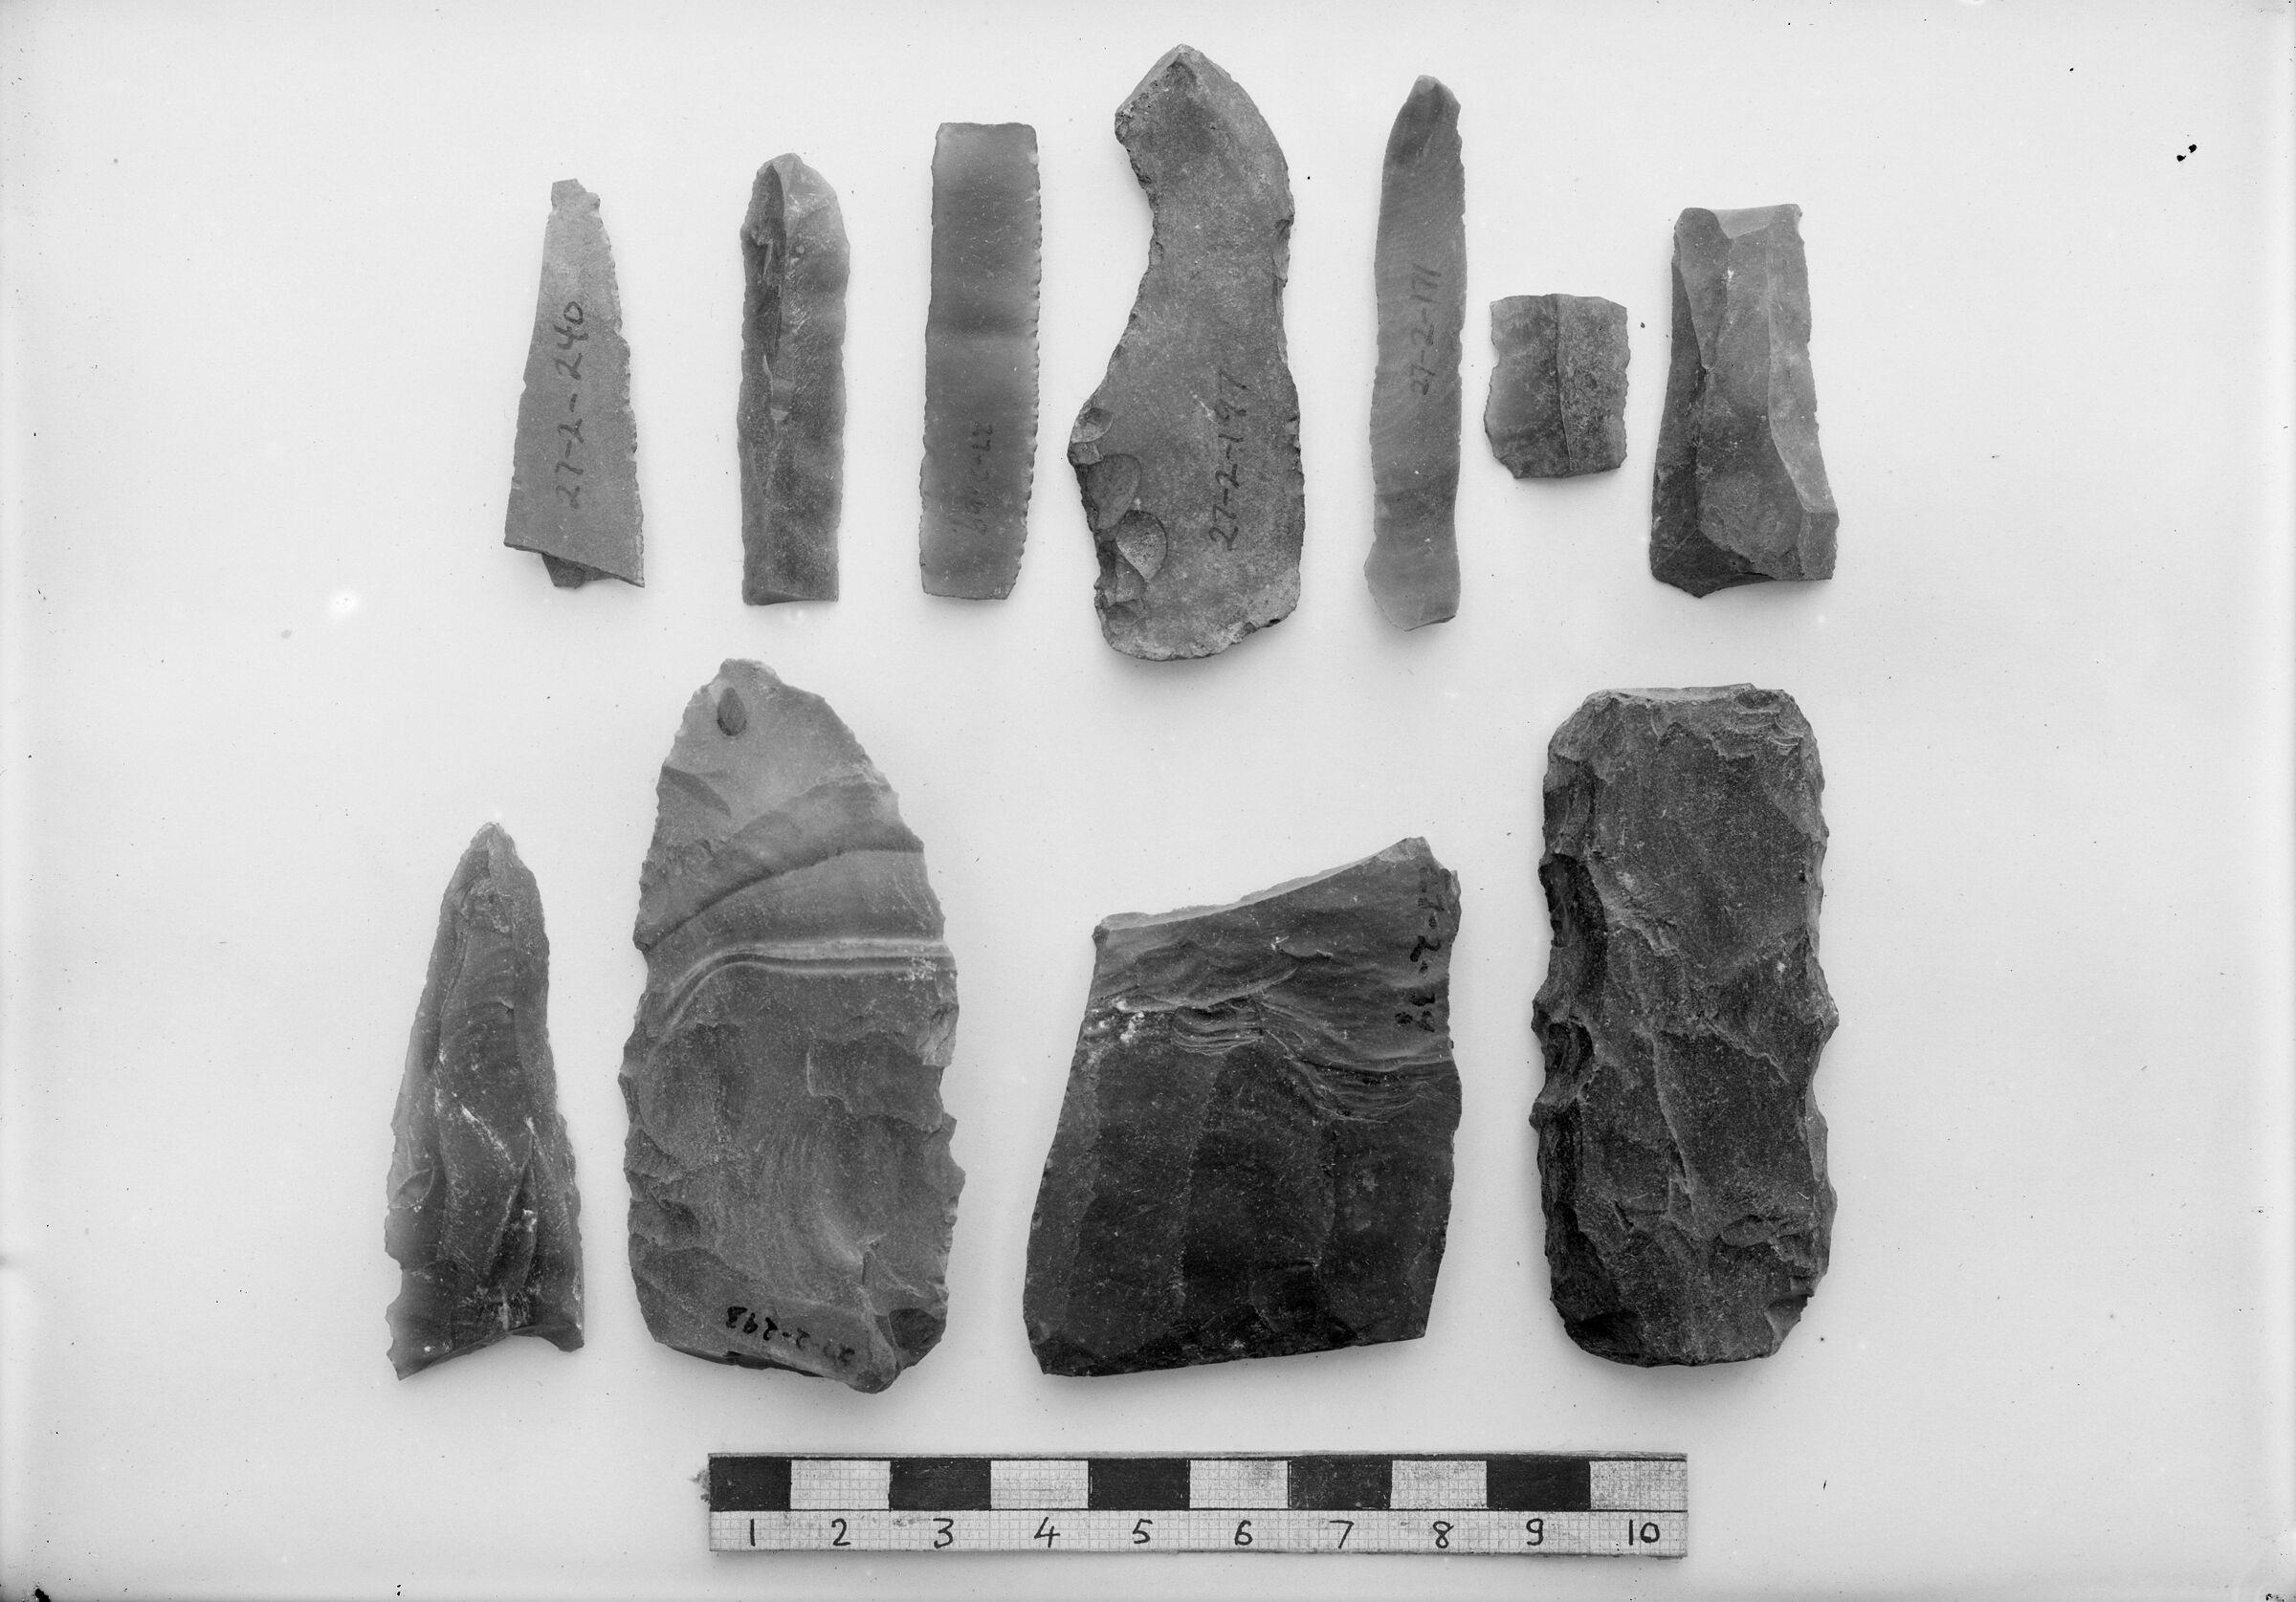 Object(s) photograph: Site: Giza; view: G 7330-7340, G 7520, street G 7300, street G 7400, G 7520, G 7430-7440